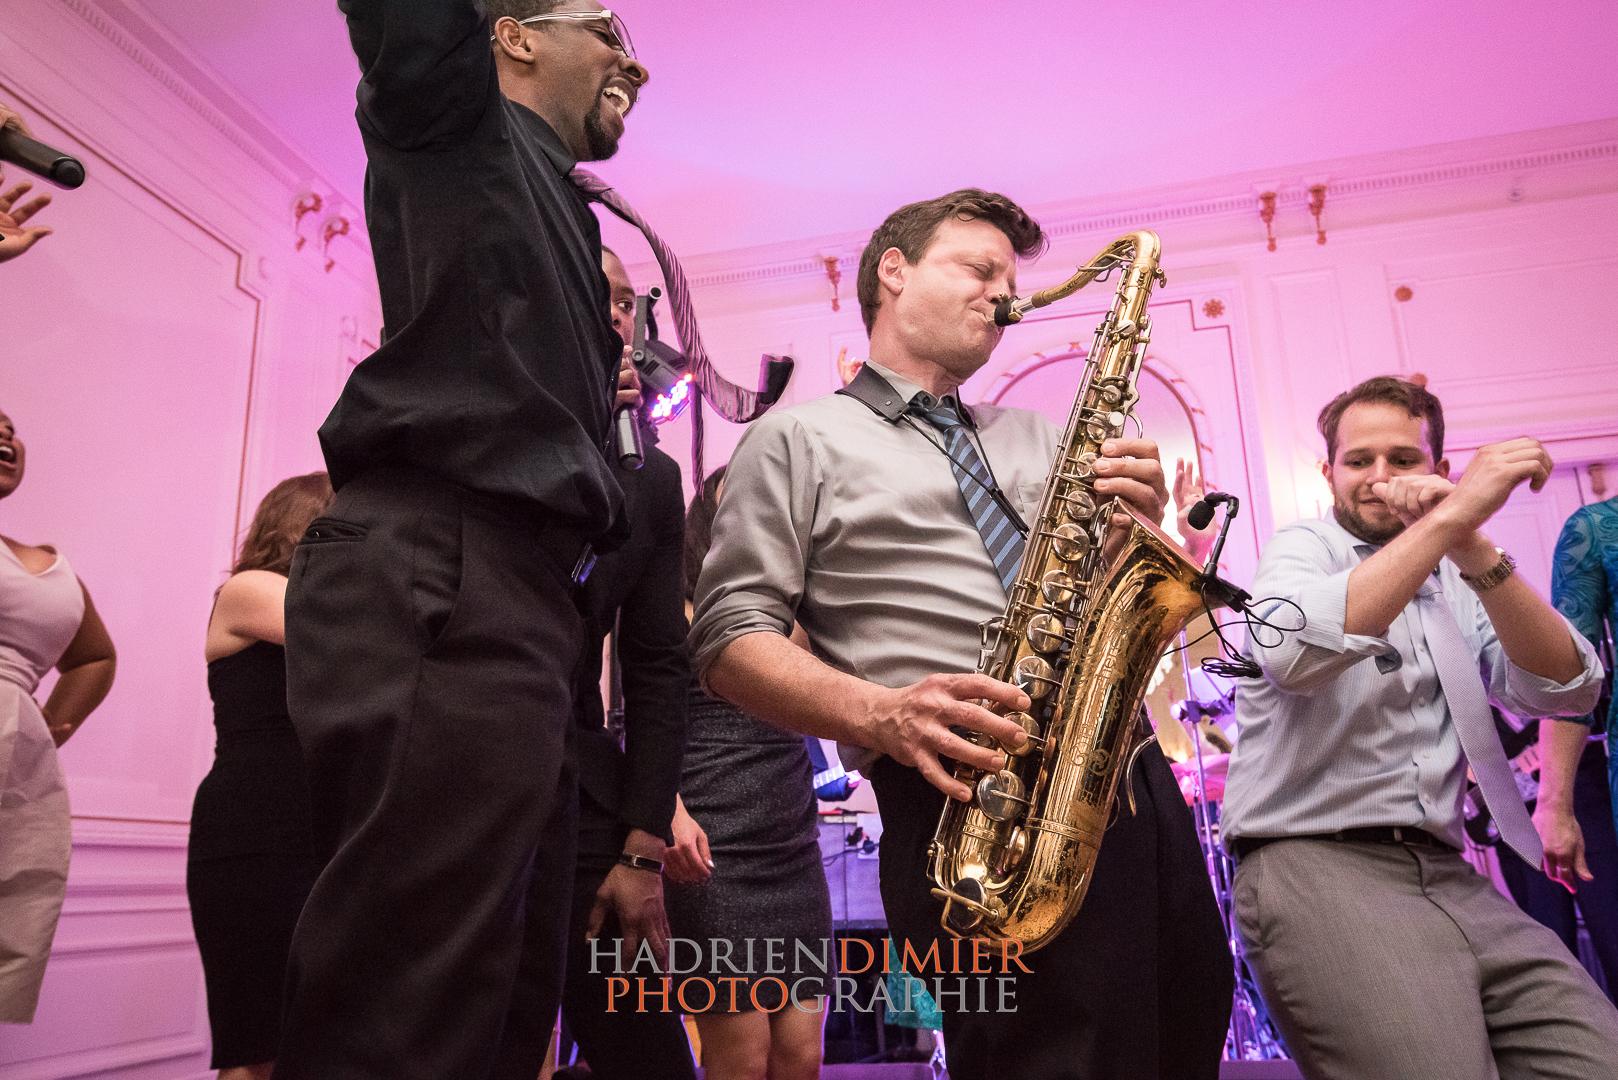 Wilson-Stevens-Productions-Splash-Band-Wedding-Hadrien Dimier Photographie-160422-00409